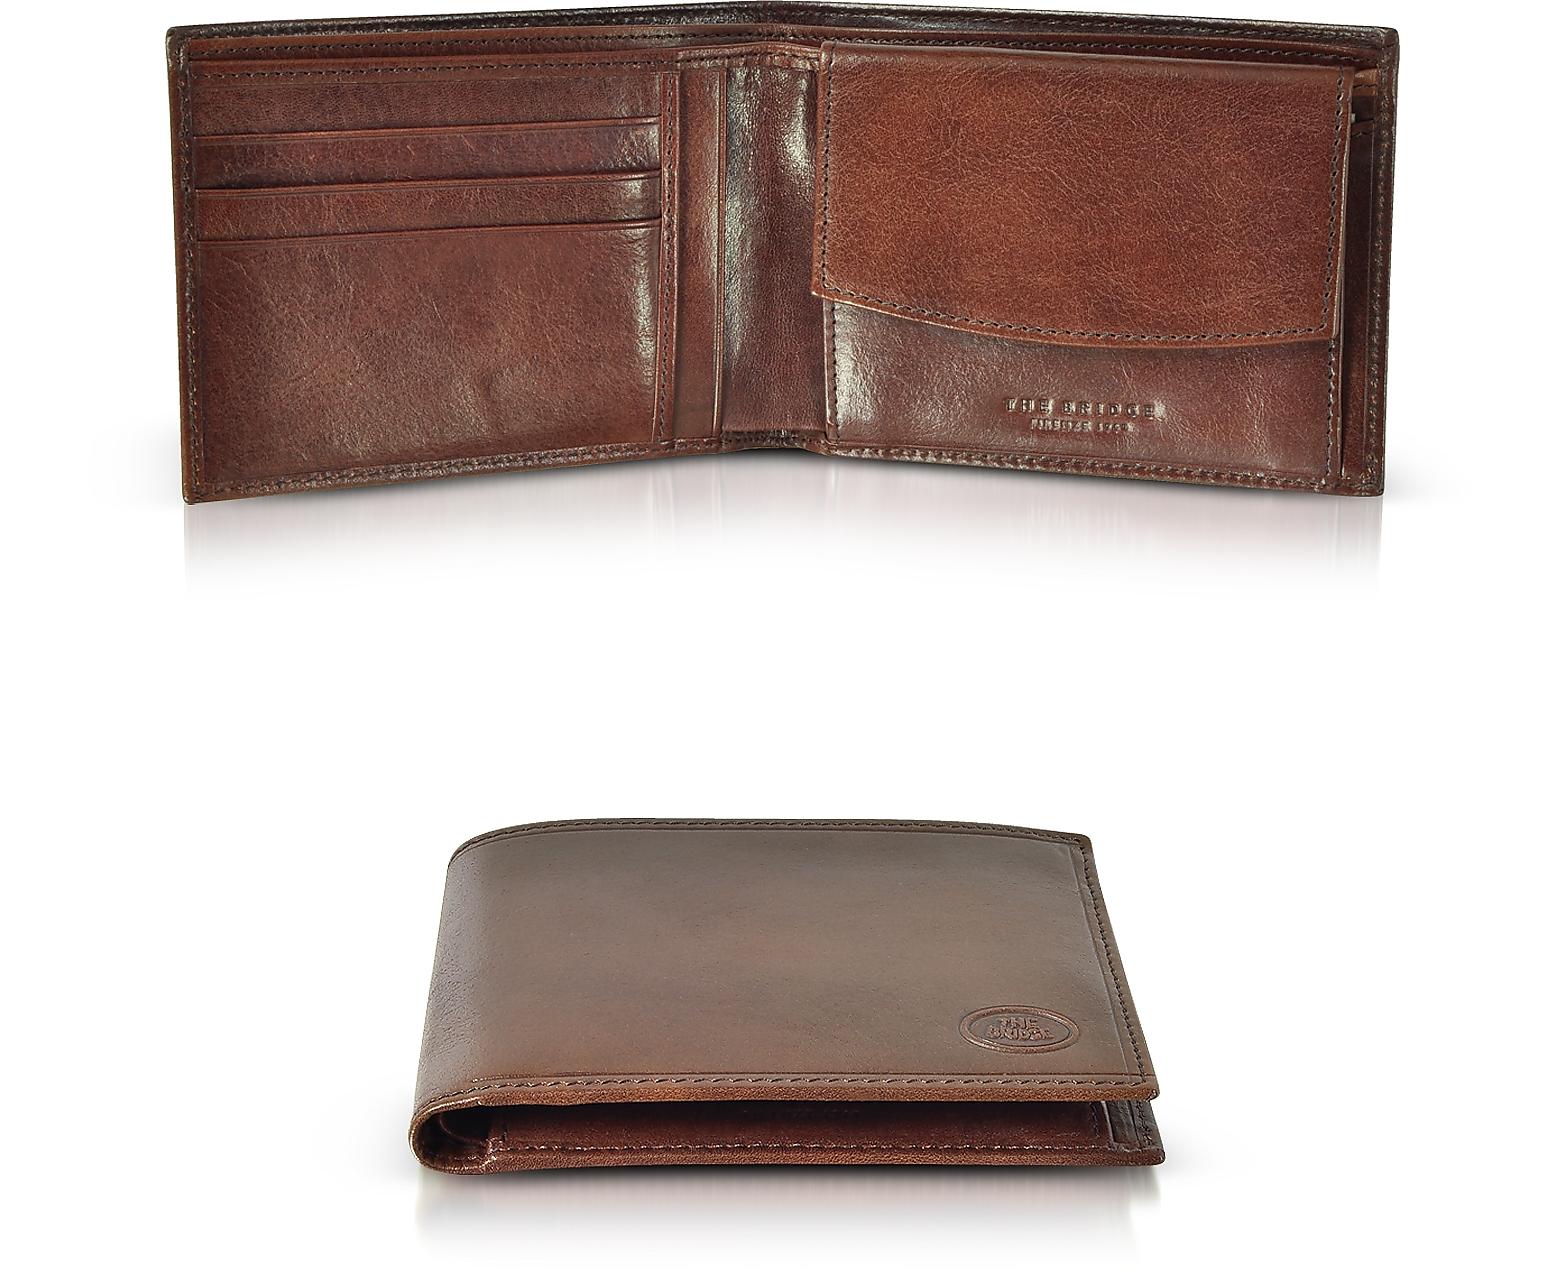 Story Uomo Brown Leather Billfold Men's Wallet